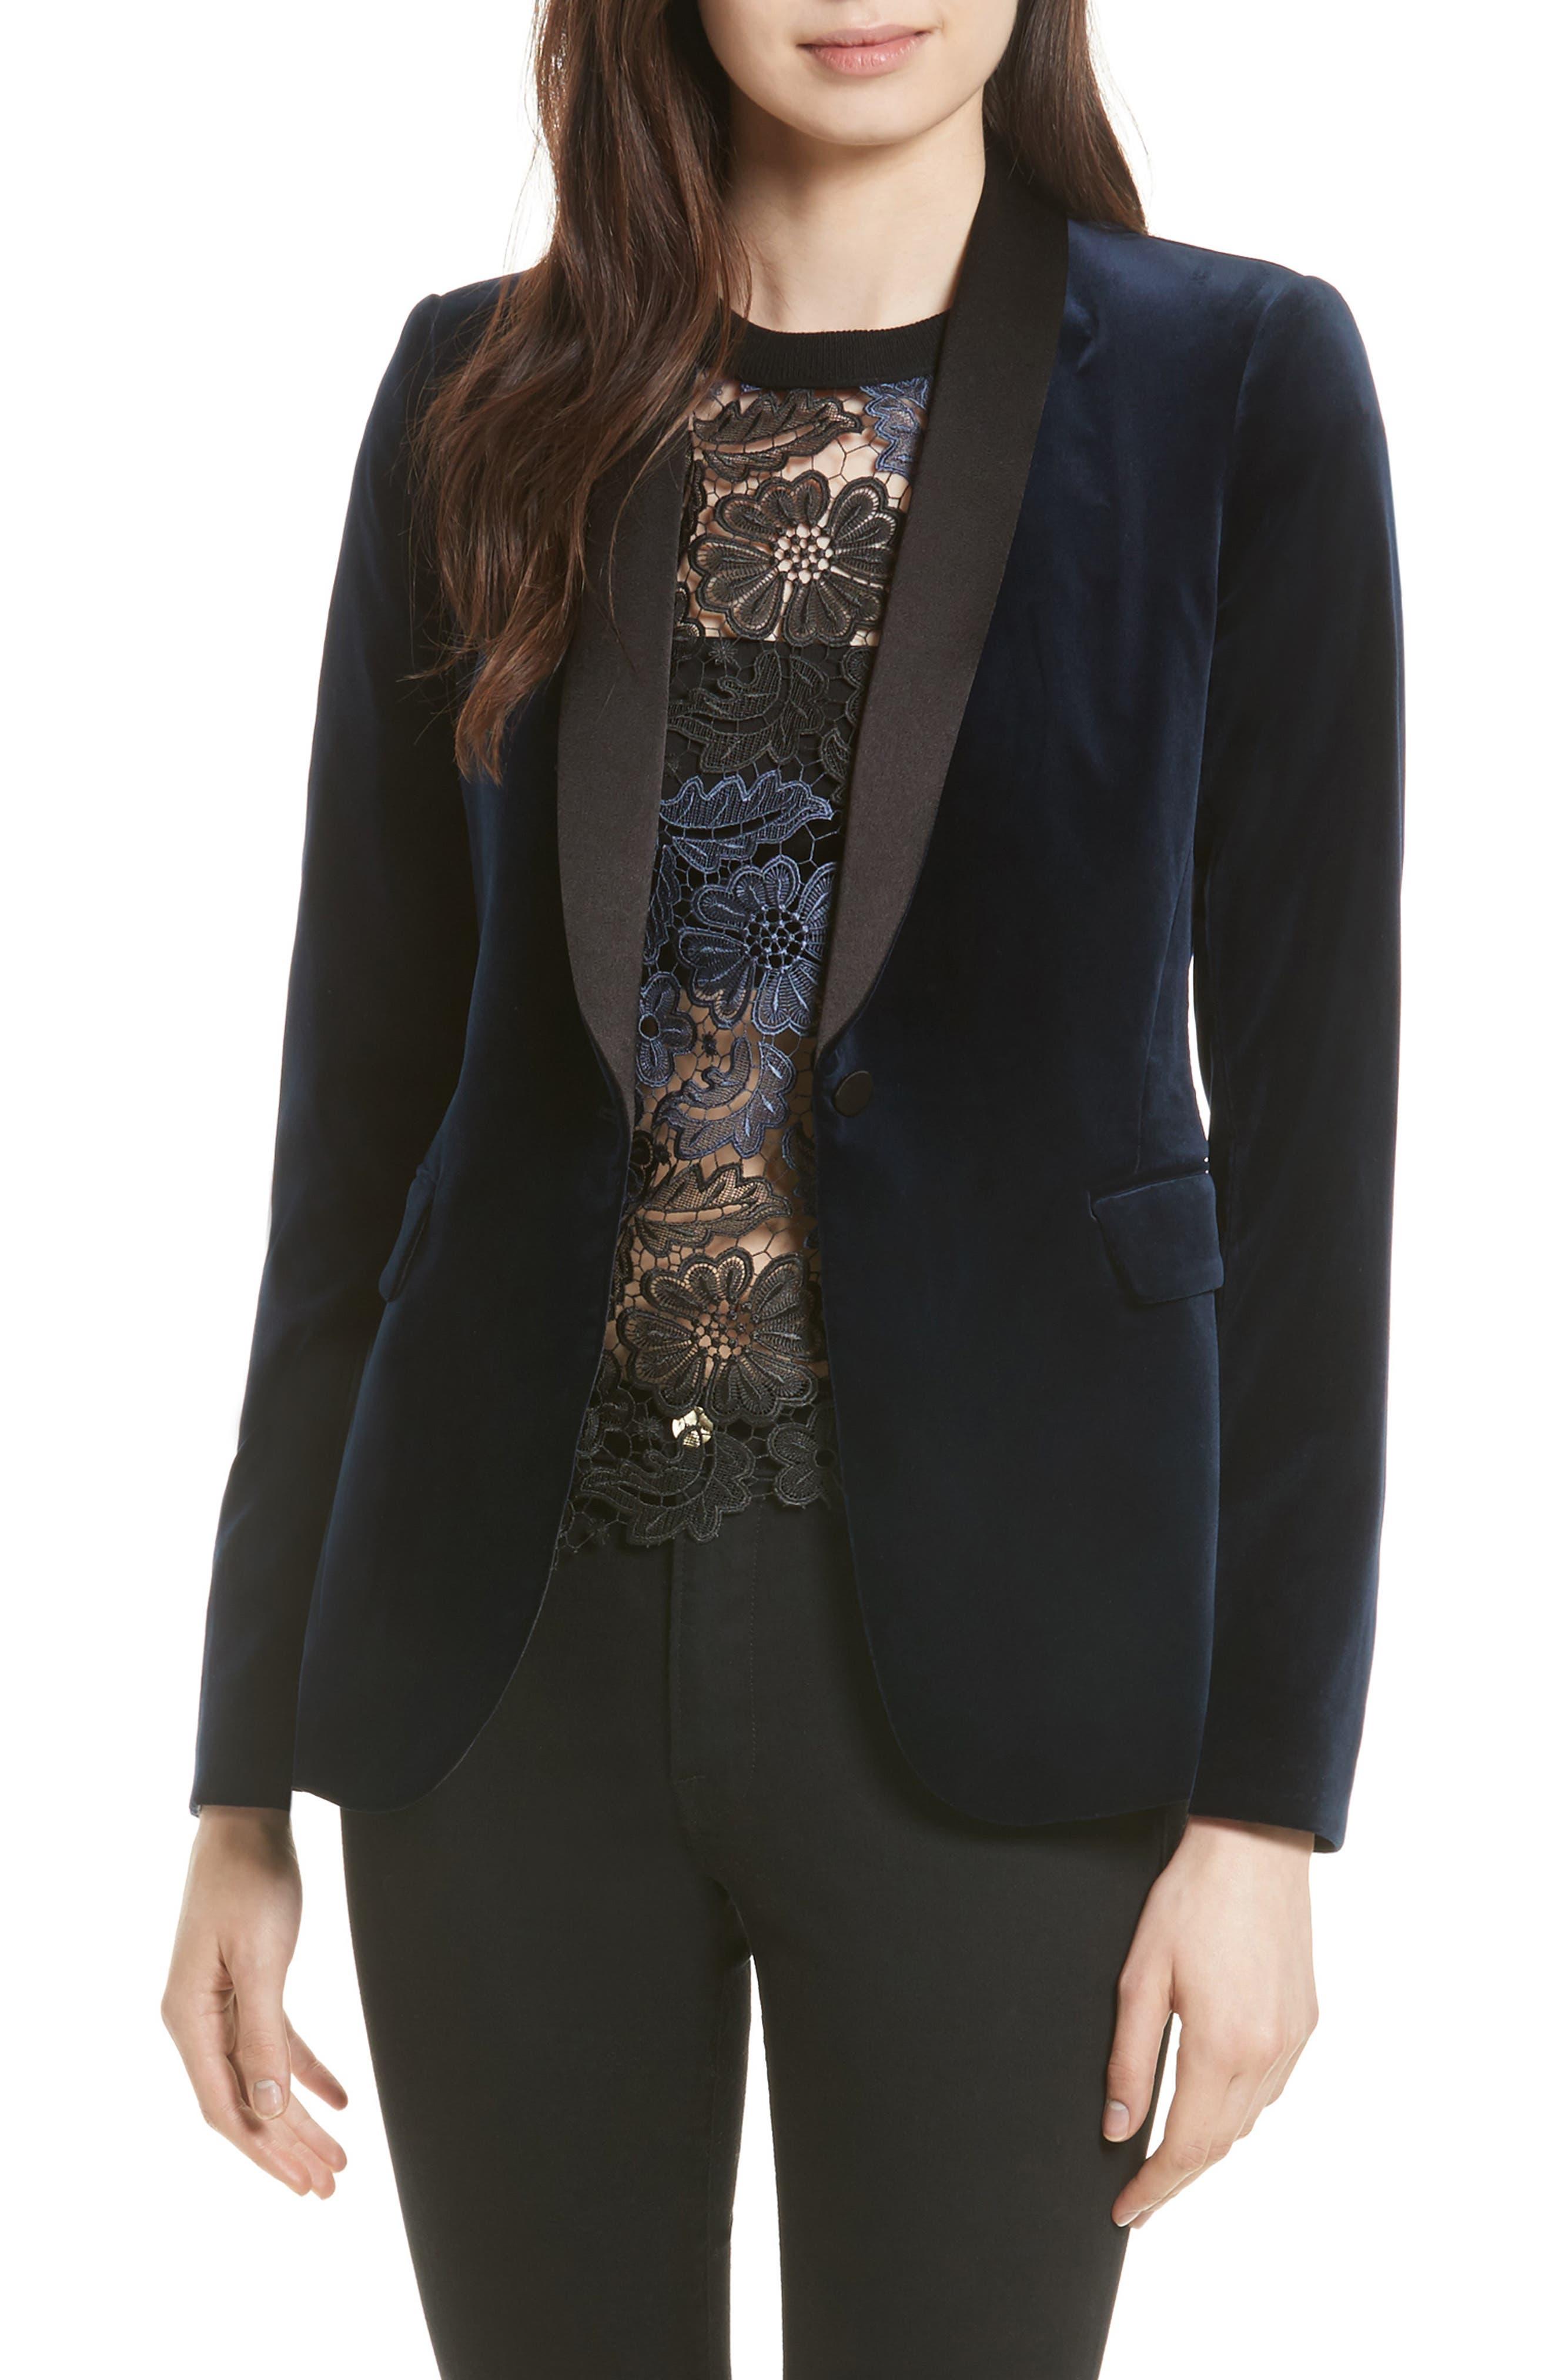 Alice + Olivia Macey Velvet Tuxedo Jacket